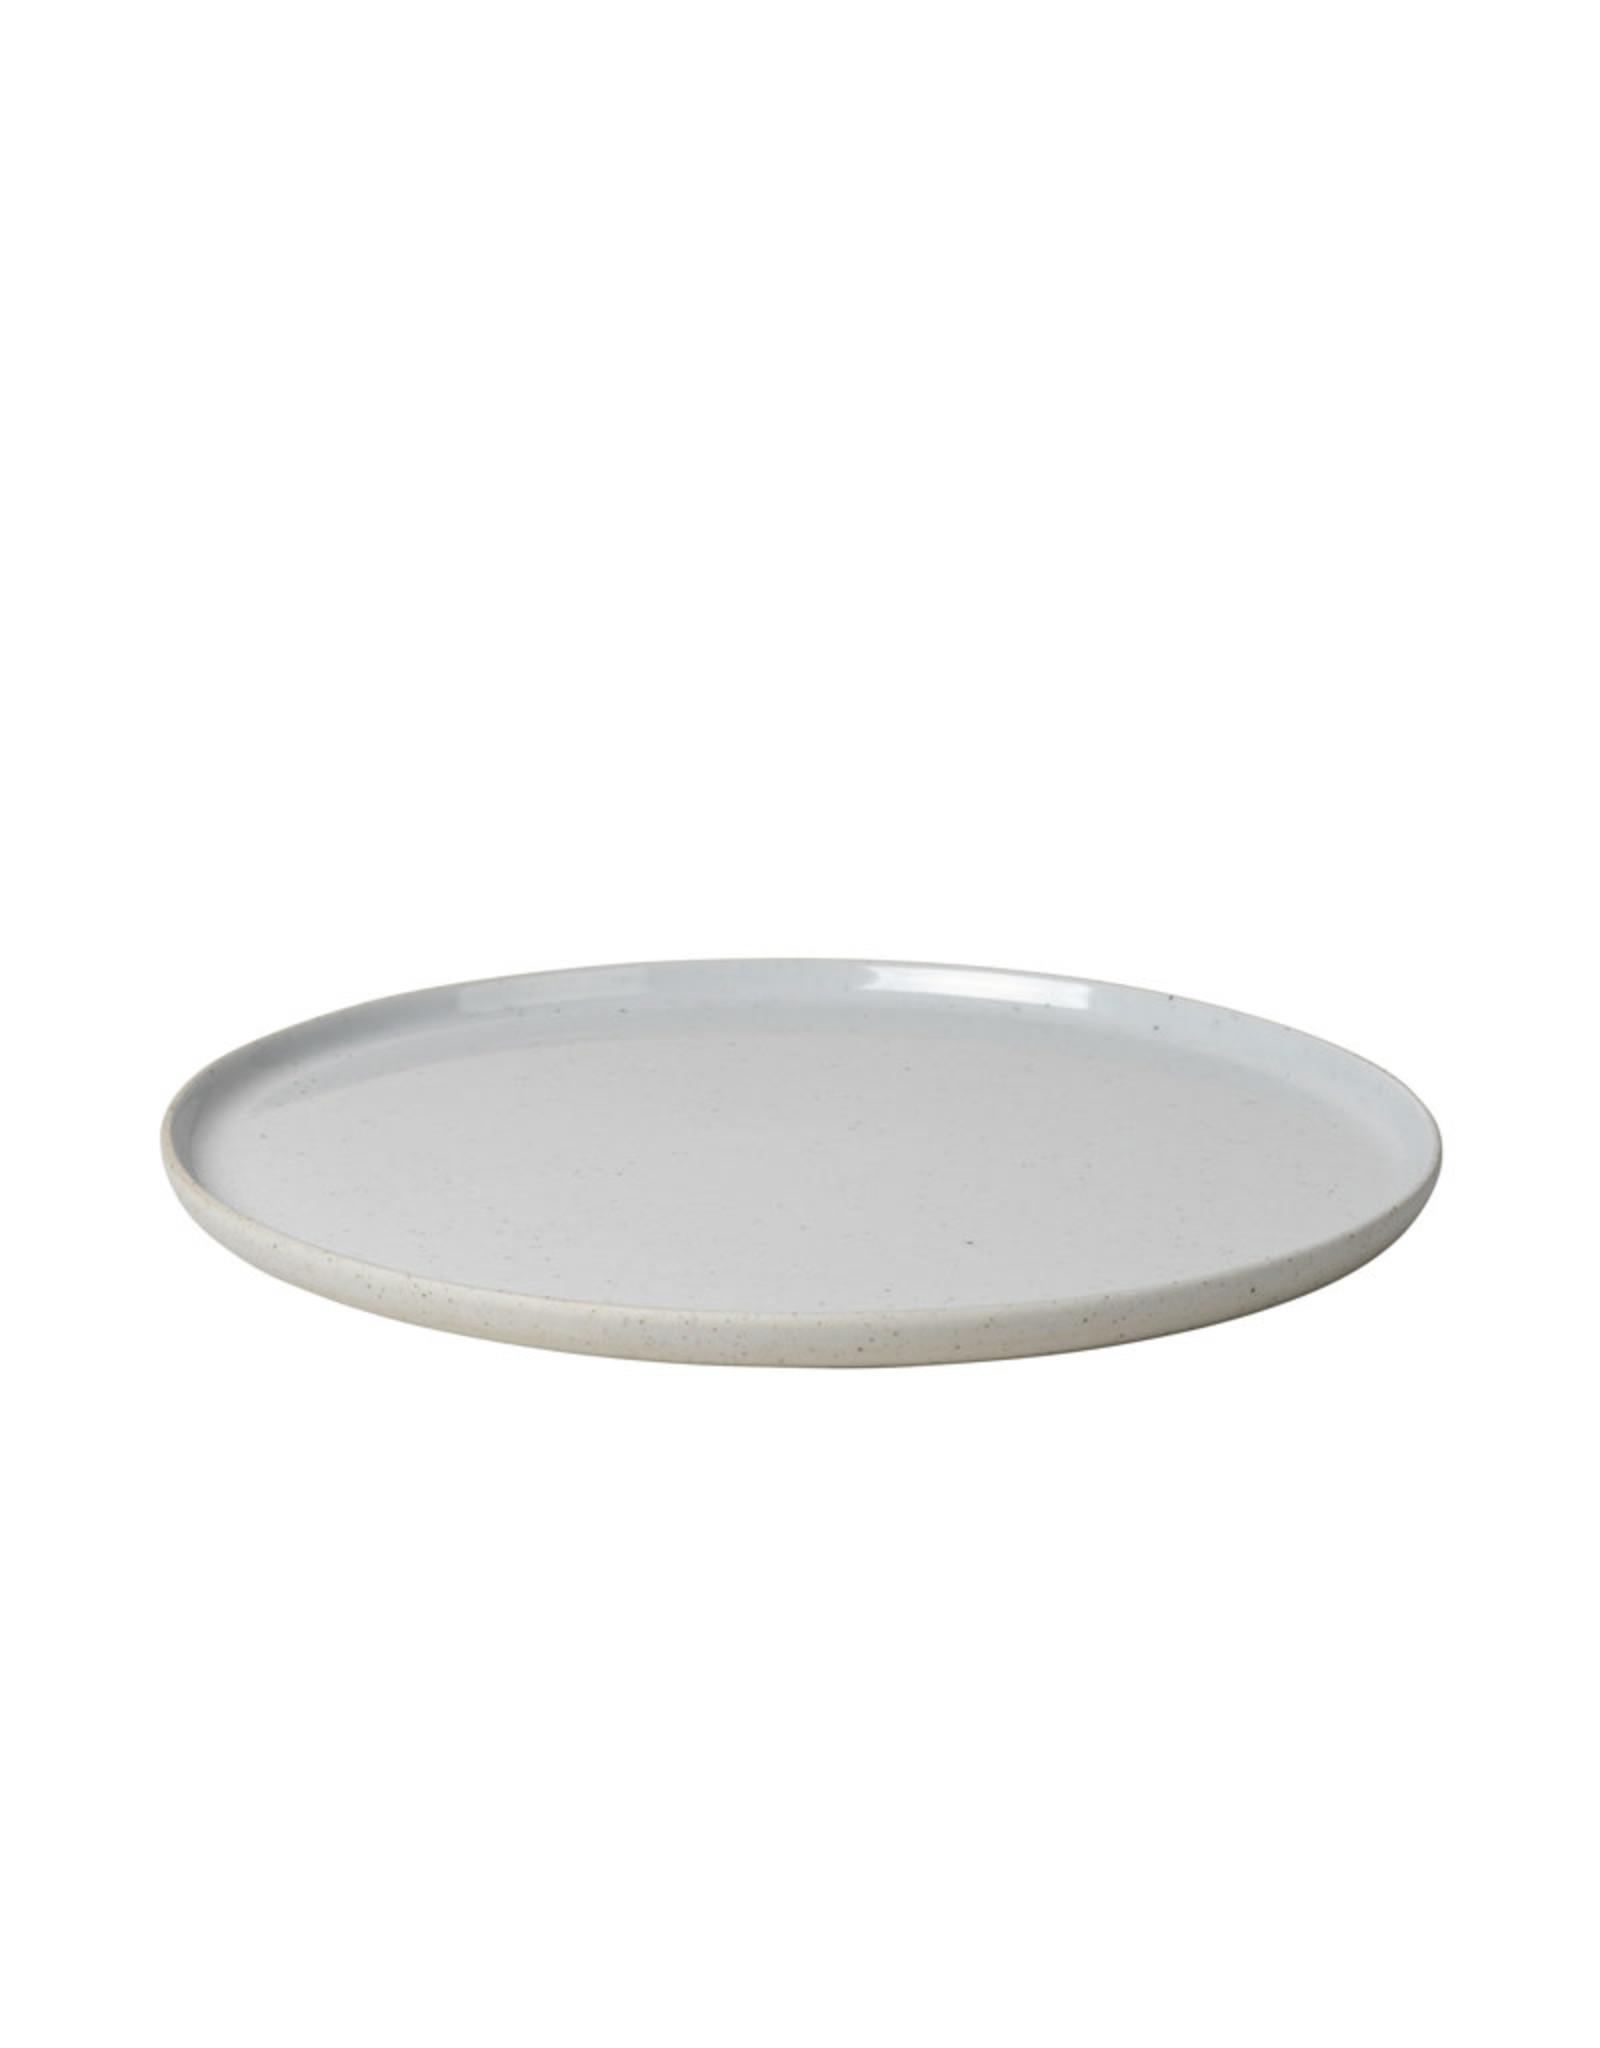 BLOMUS BLOMUS SABLO DINNER PLATE Ø26